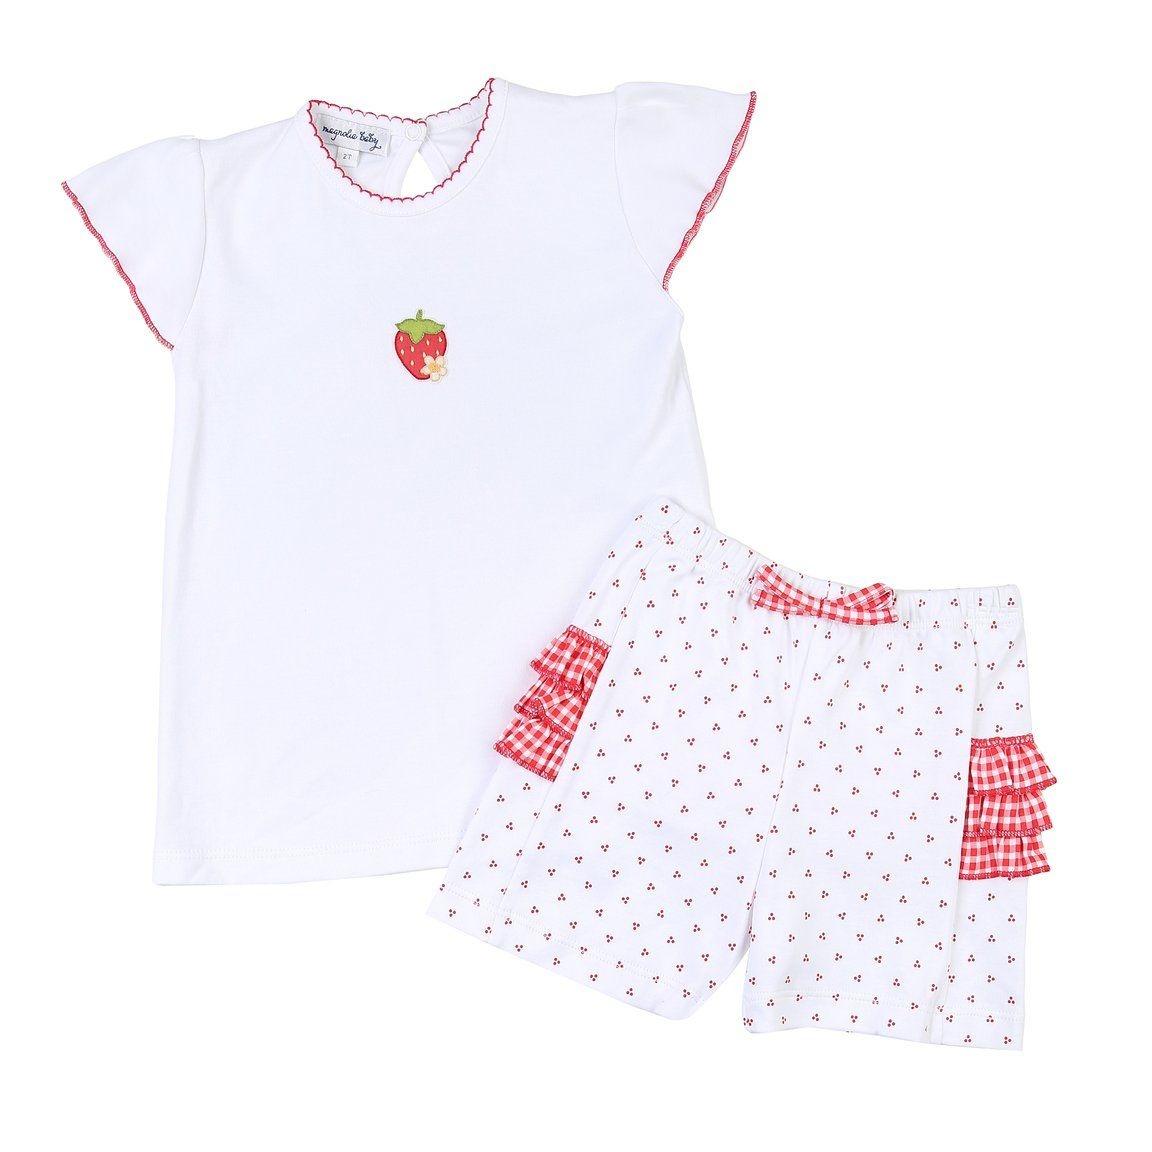 Magnolia Baby Fresh Strawberries Ruffle Flutter -